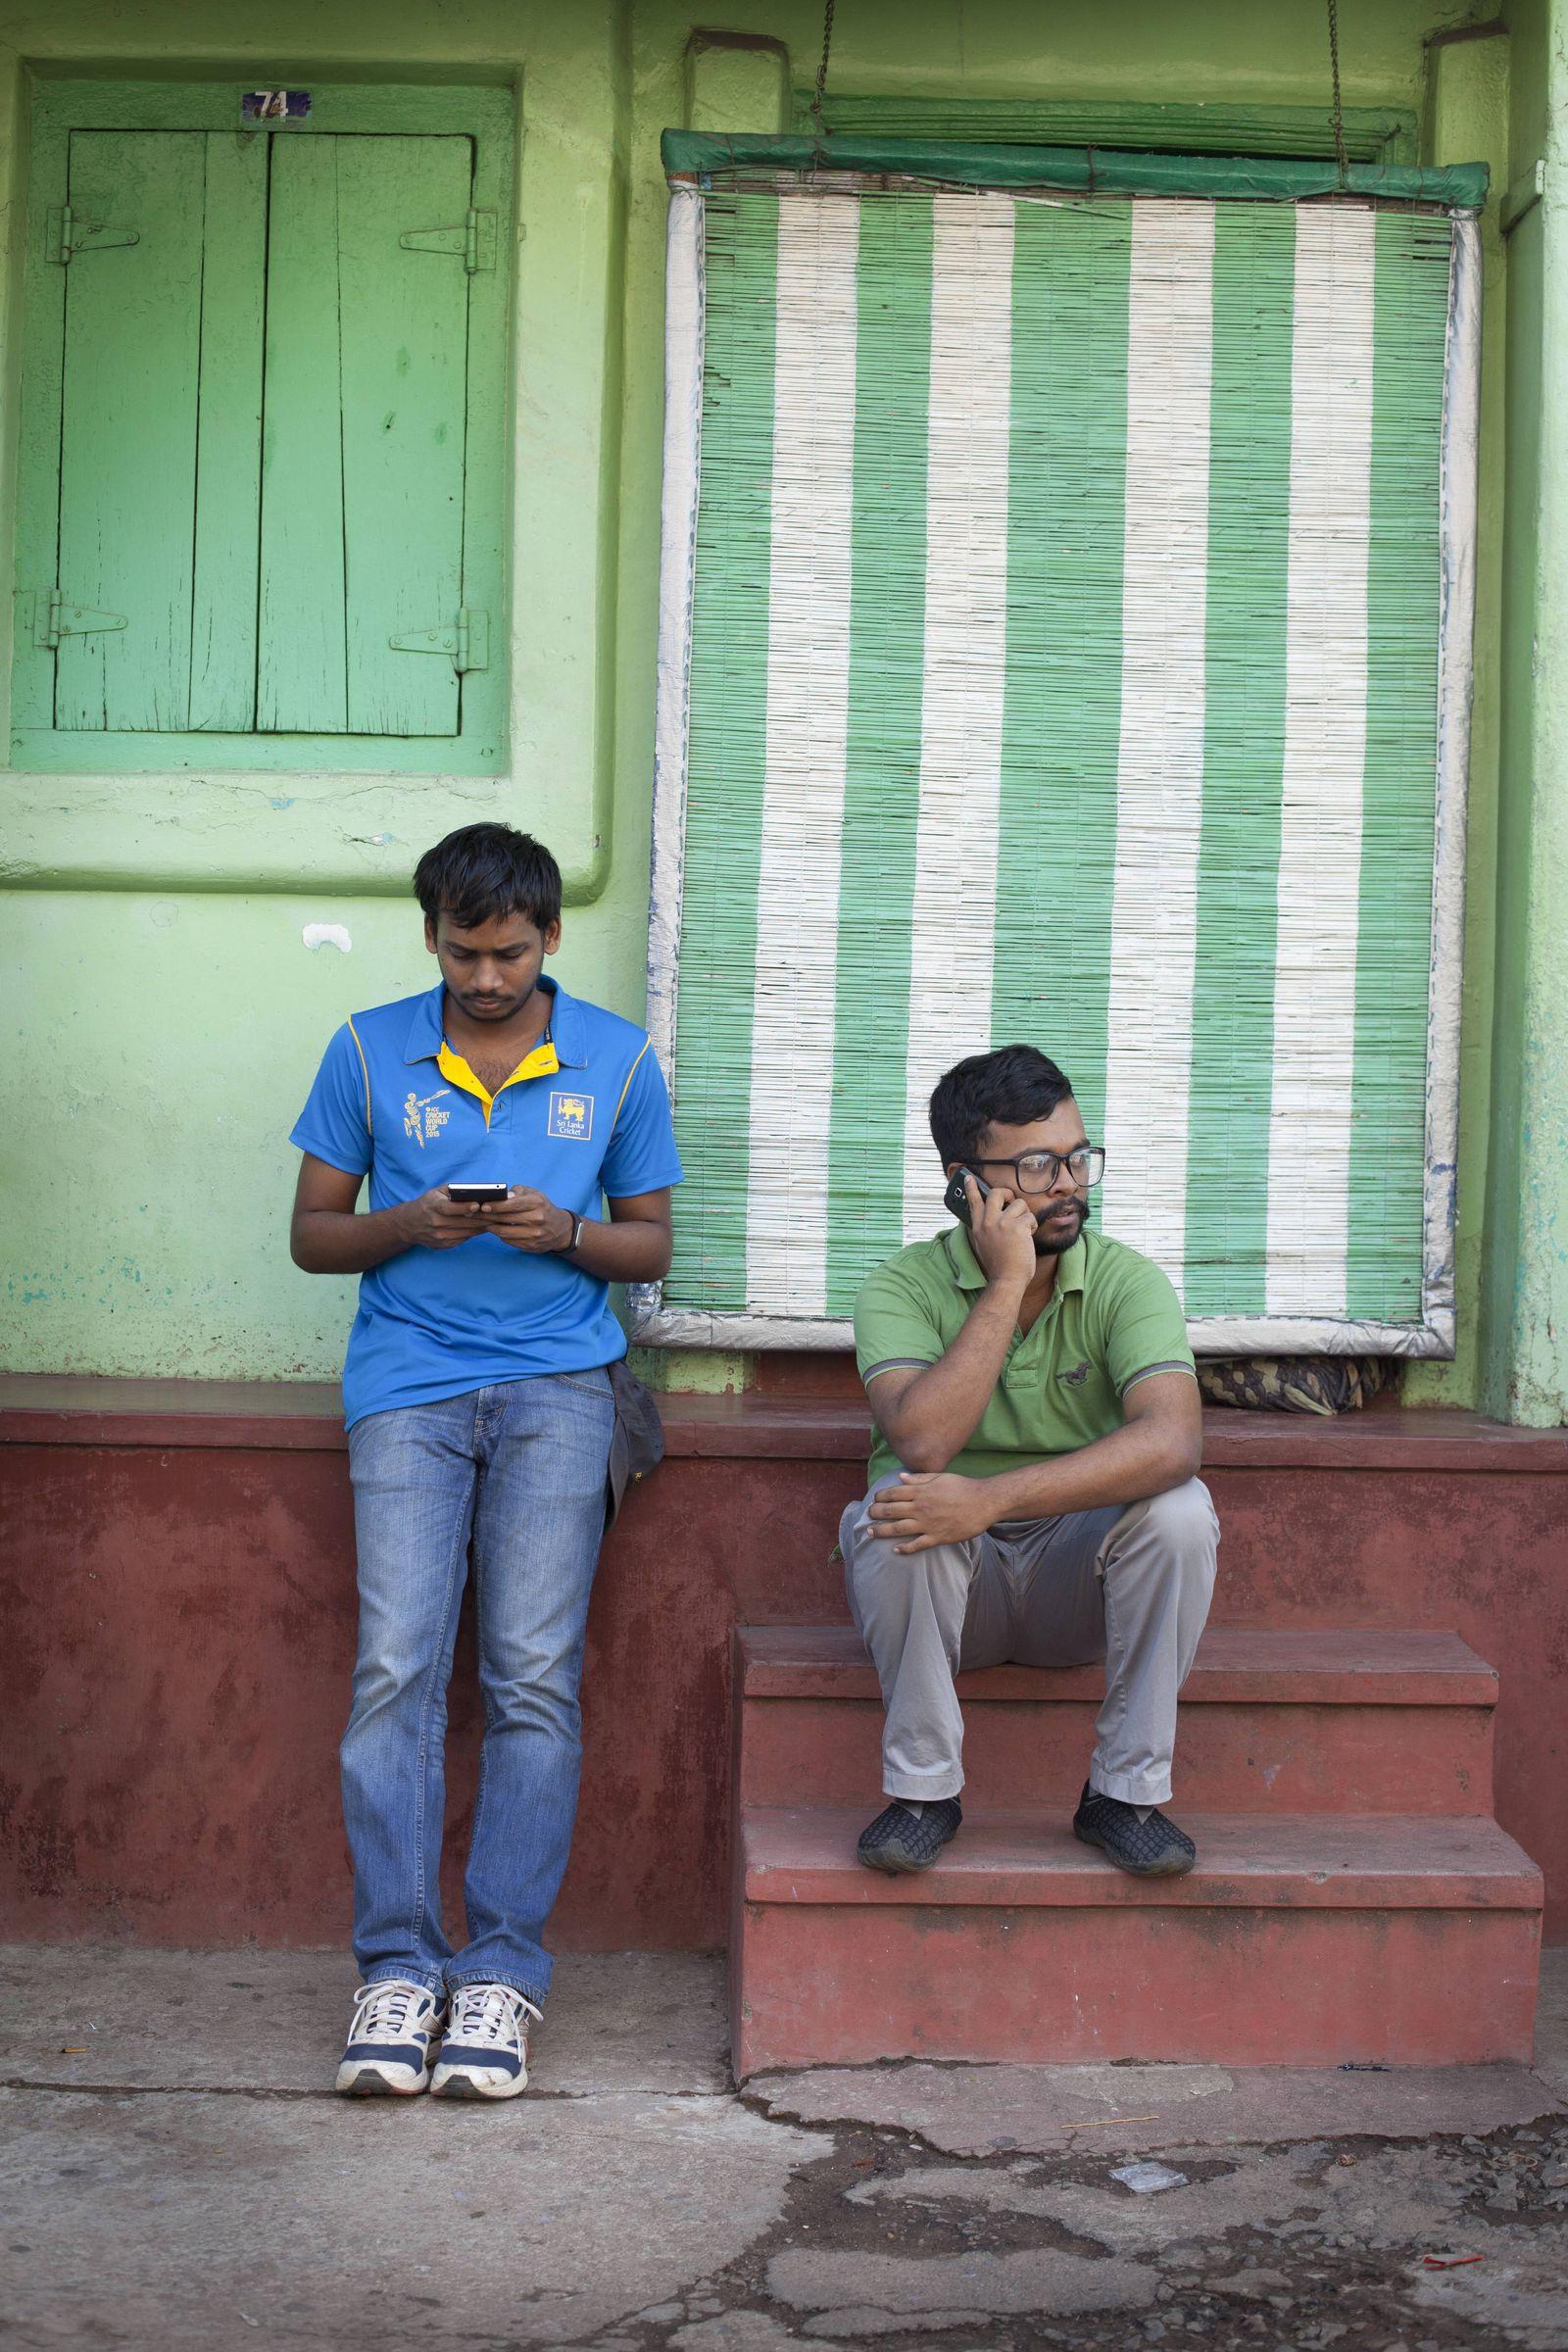 EINMALIGE VERWENDUNG Sri Lanka/ Colombo/ Junge Männer mit Handys/ Smartphones